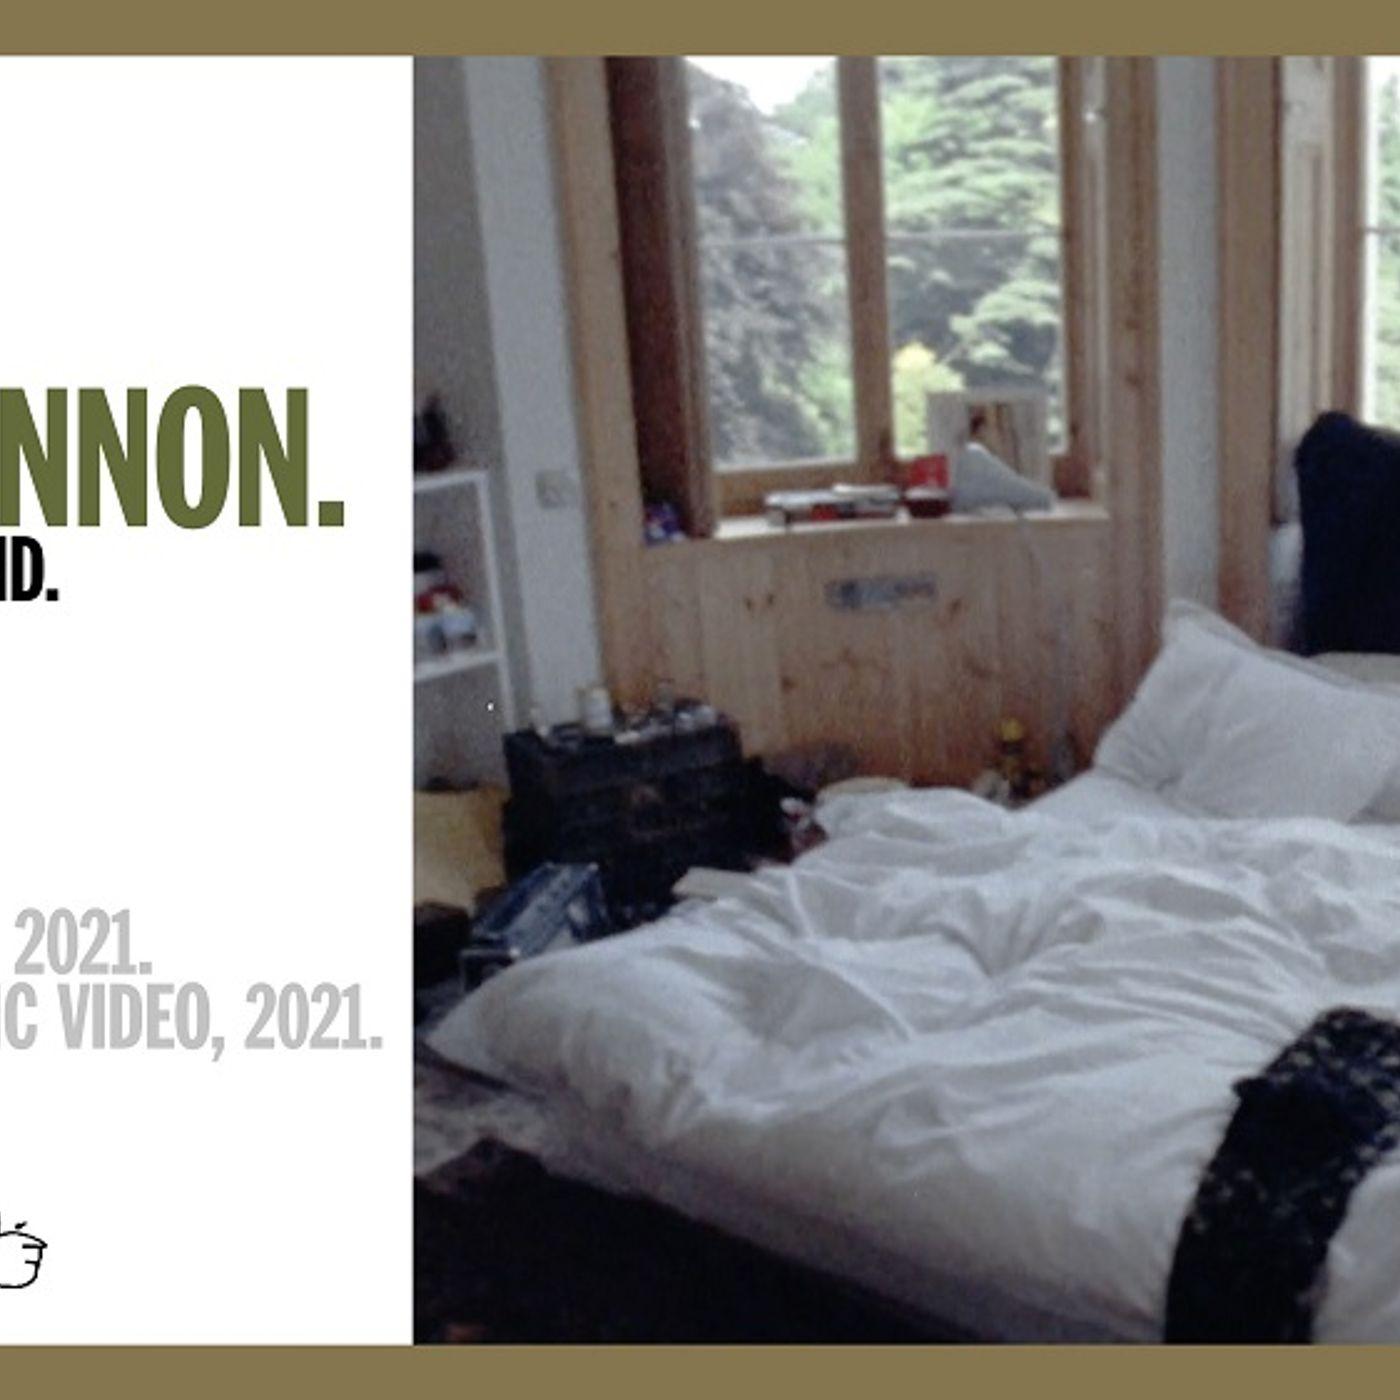 ESPECIAL JOHN LENNON PLASTIC ONO BAND Pt05 #avengers #wahtif #shadowsfx #venom2 #venom #shangchi #doompatrol #scream #thebatman